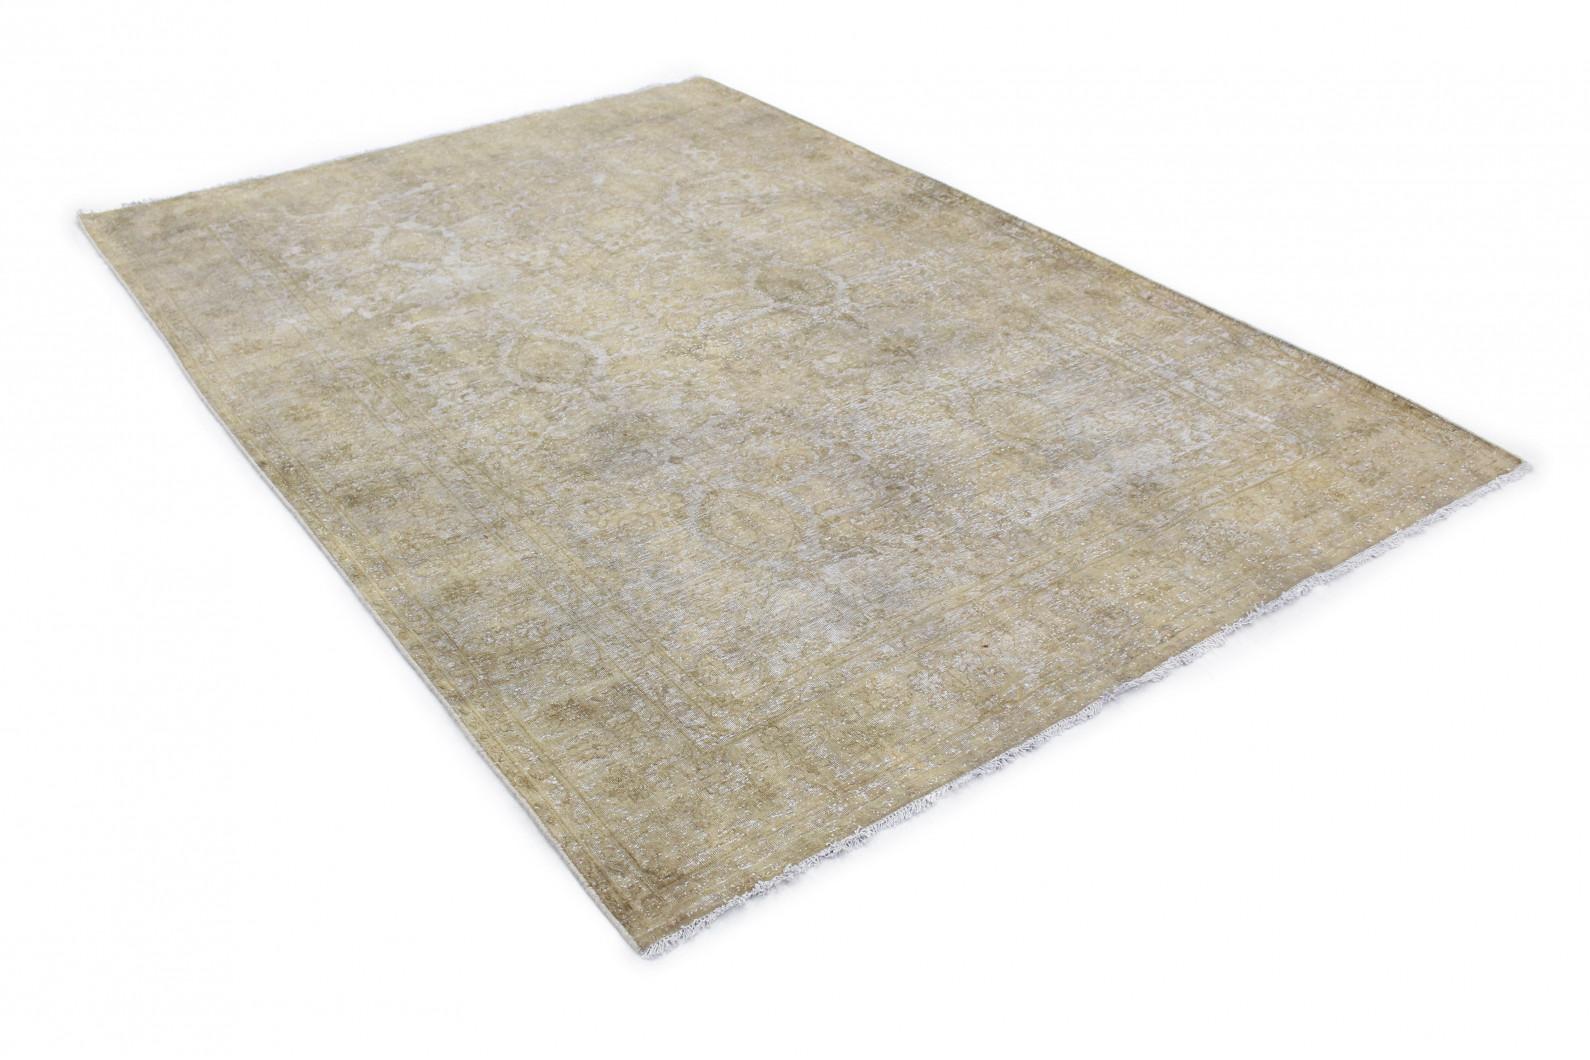 vintage teppich grau in 300x200 1001 177276 bei. Black Bedroom Furniture Sets. Home Design Ideas